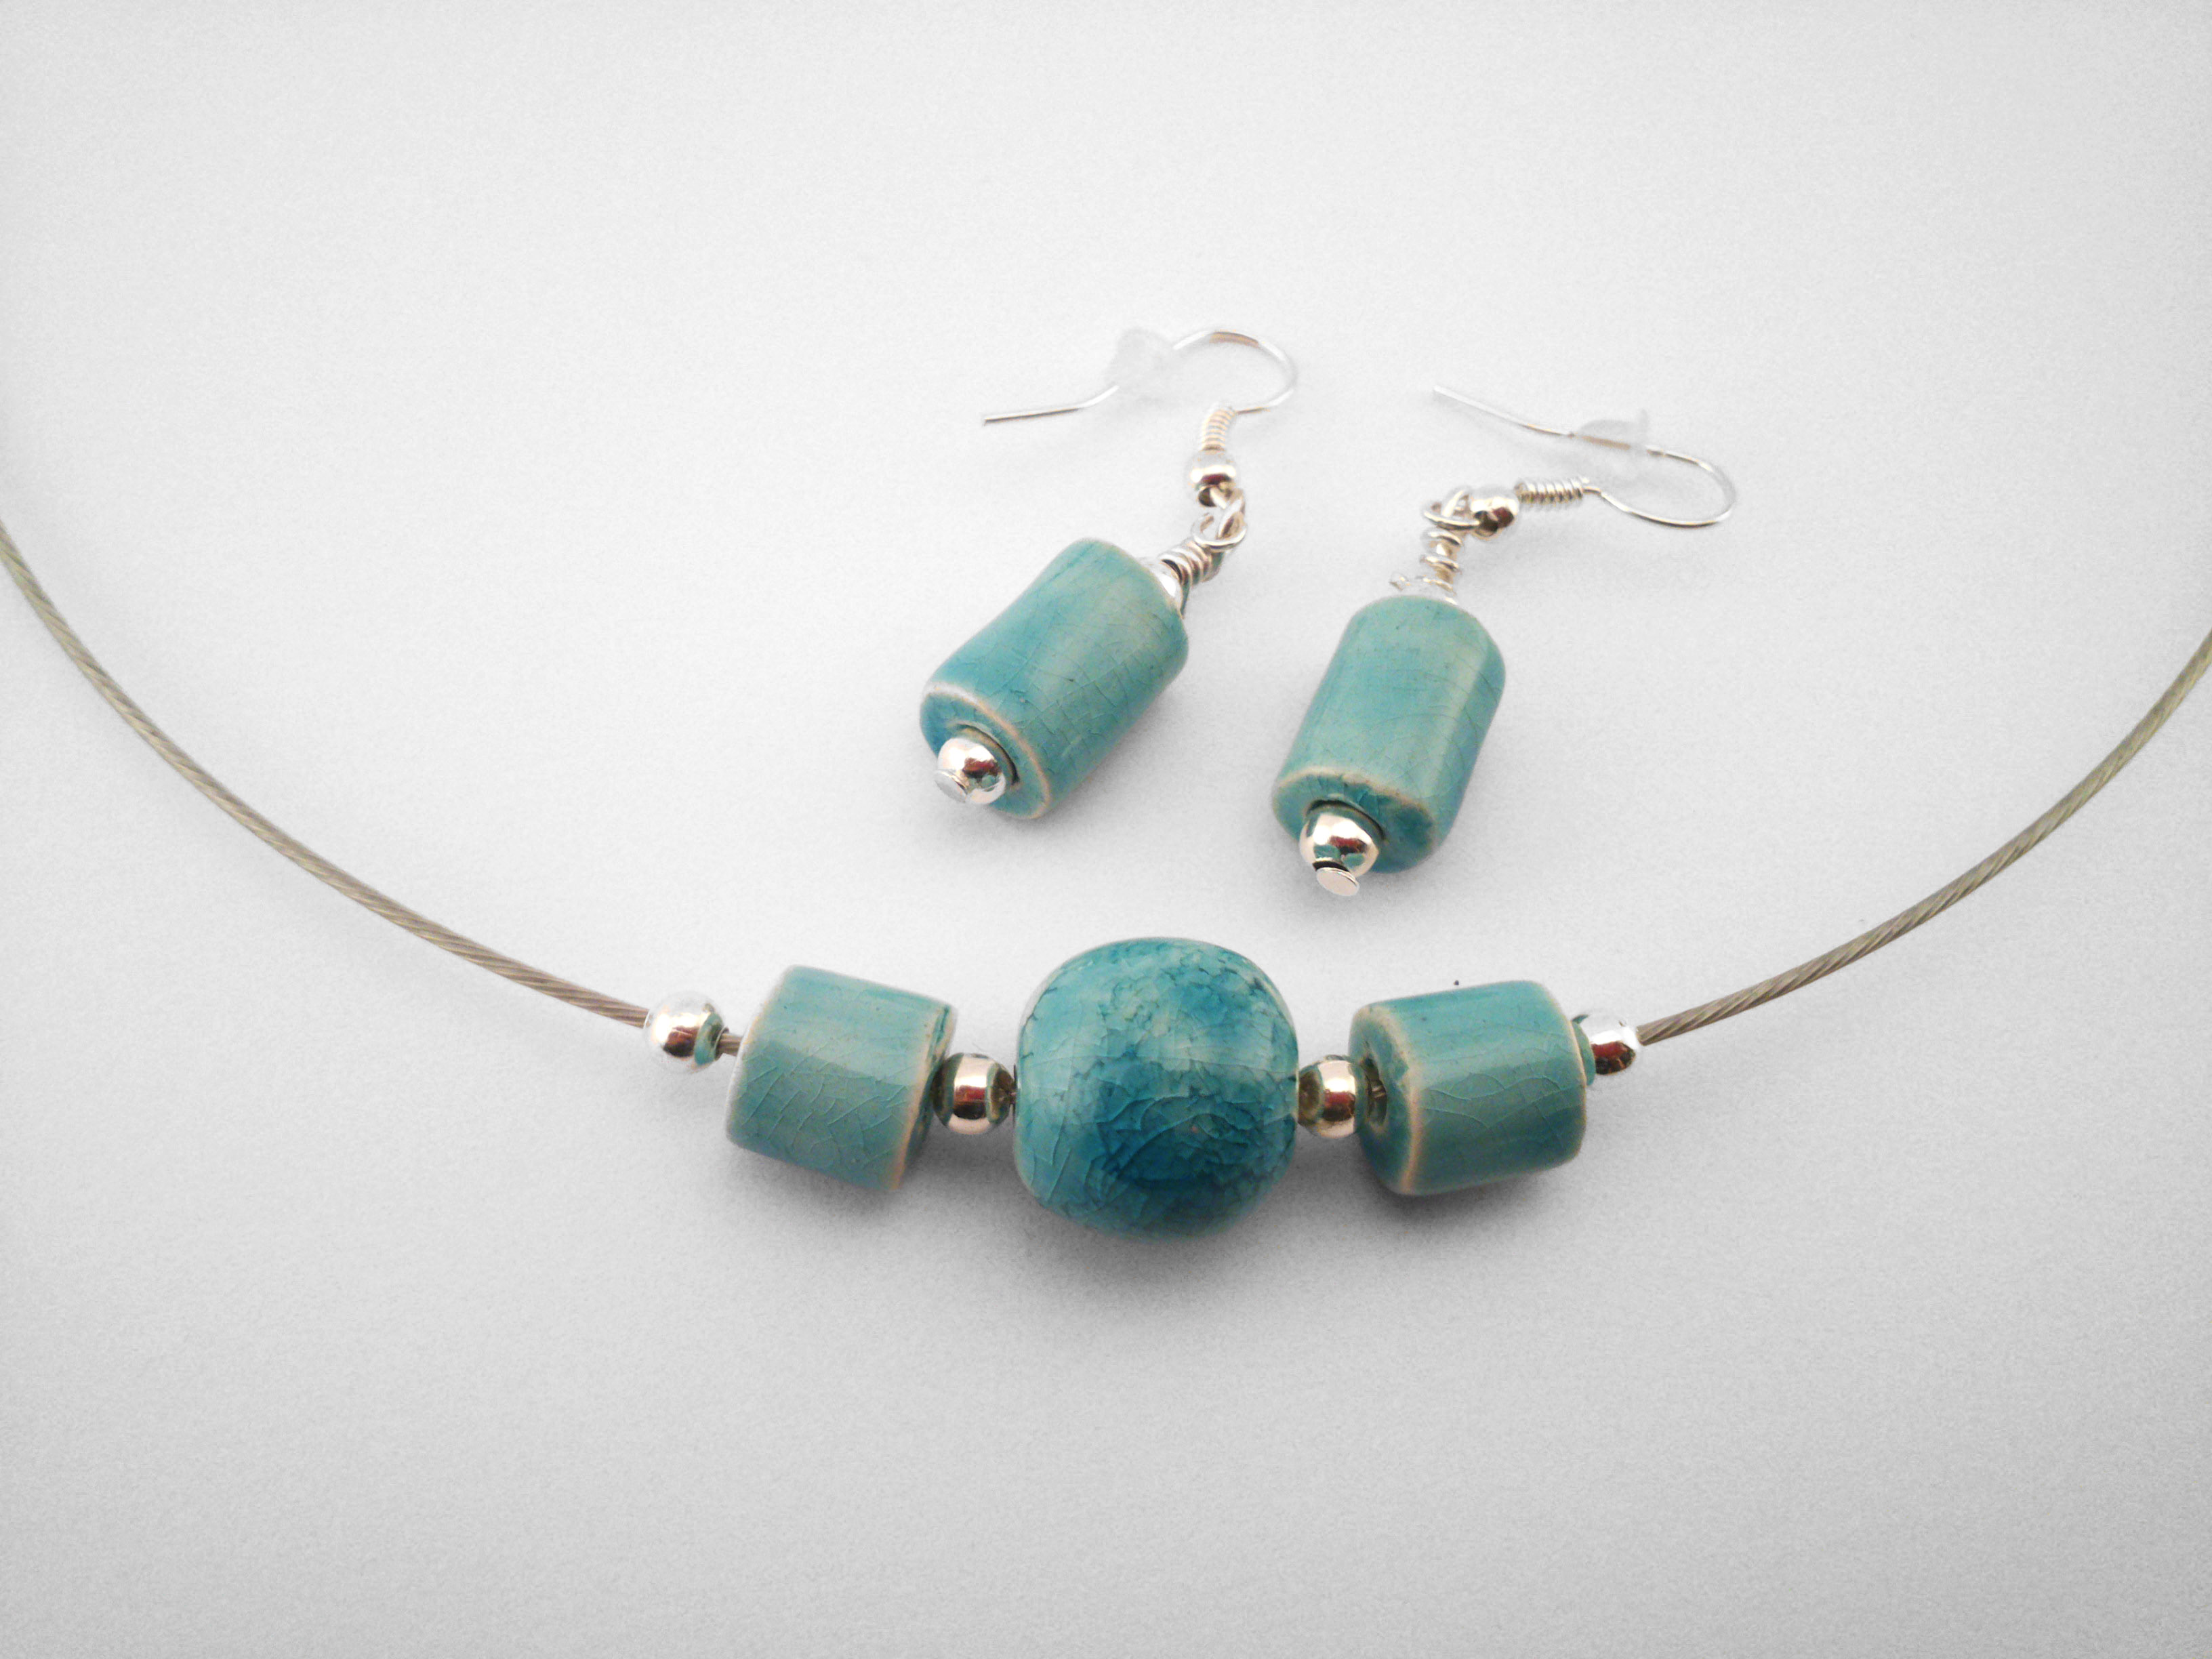 Turquoise Necklace and Pendants - Ildikó Károlyi